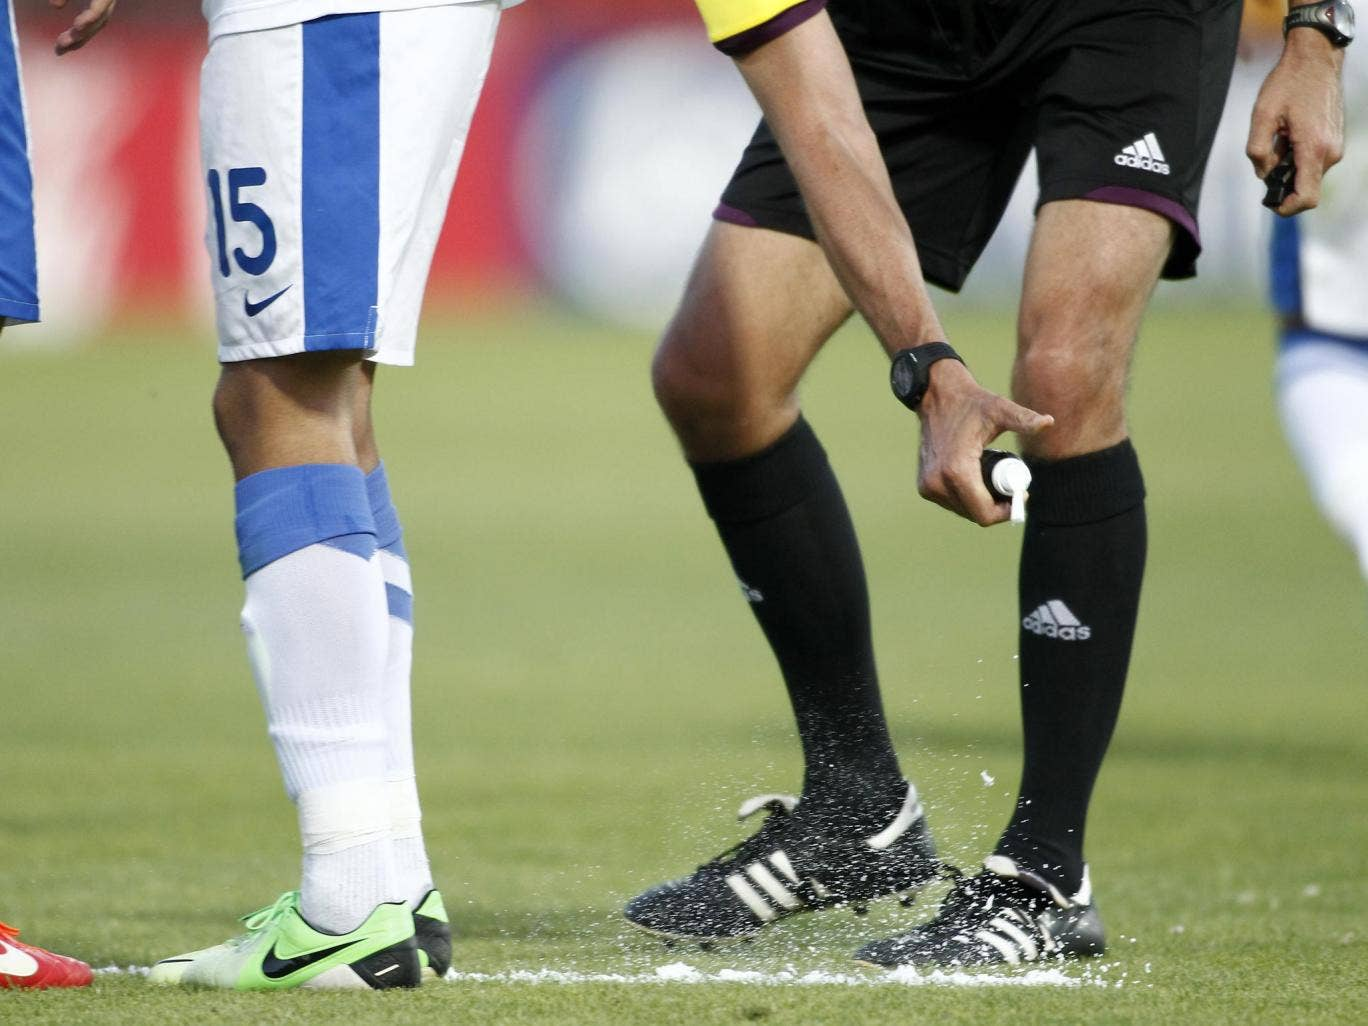 A referee uses vanishing spray